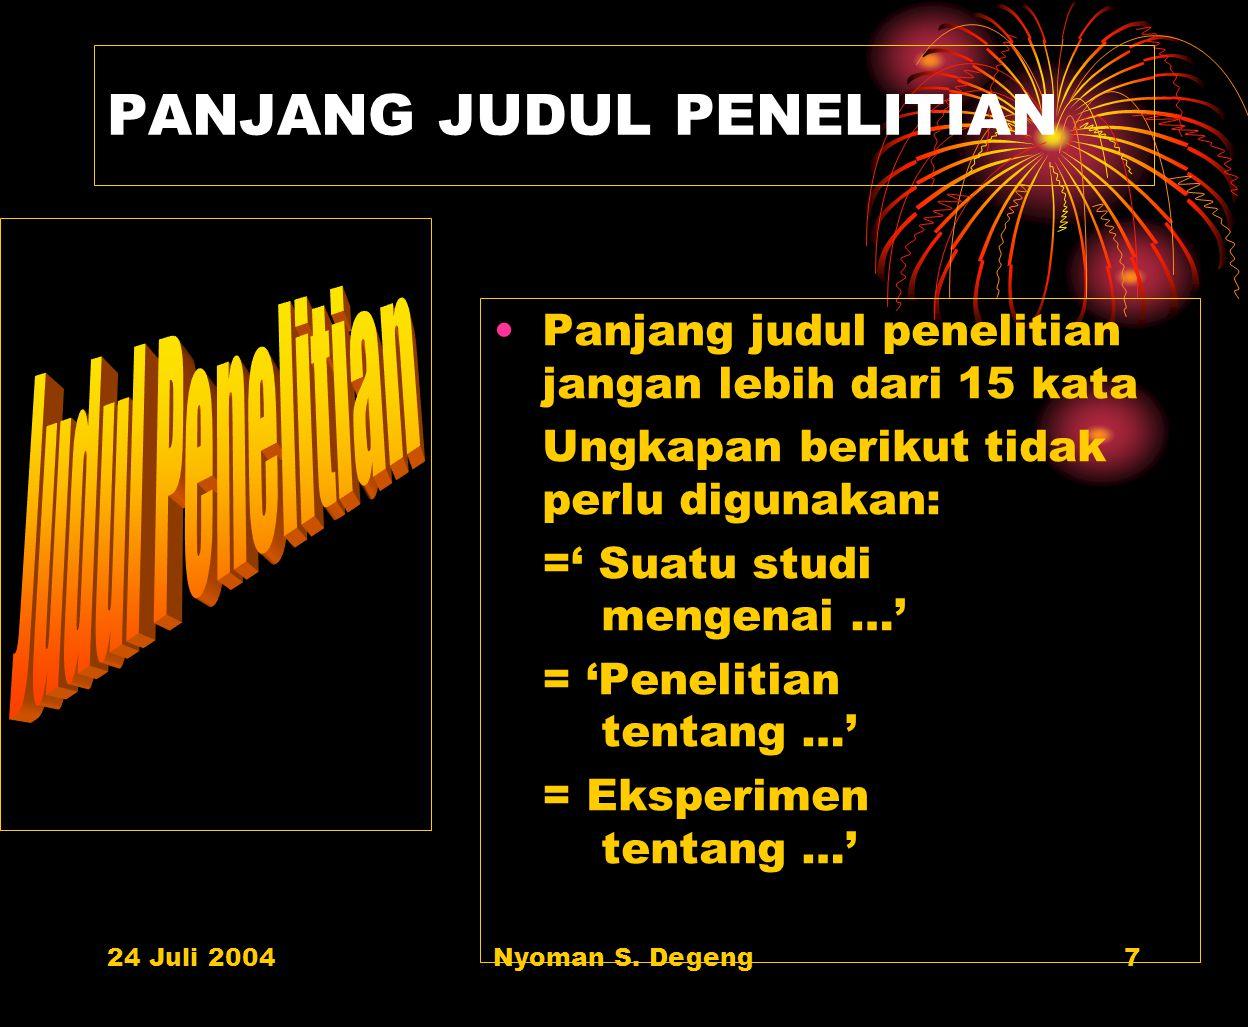 24 Juli 2004Nyoman S. Degeng6 HUBUNGAN ANTAR VARIABEL SEBAB HUBUNGAN AKIBAT VARIABEL BEBAS VARIABEL MODERATOR VARIABEL KONTROL VARIABEL ANTARA VARIABE